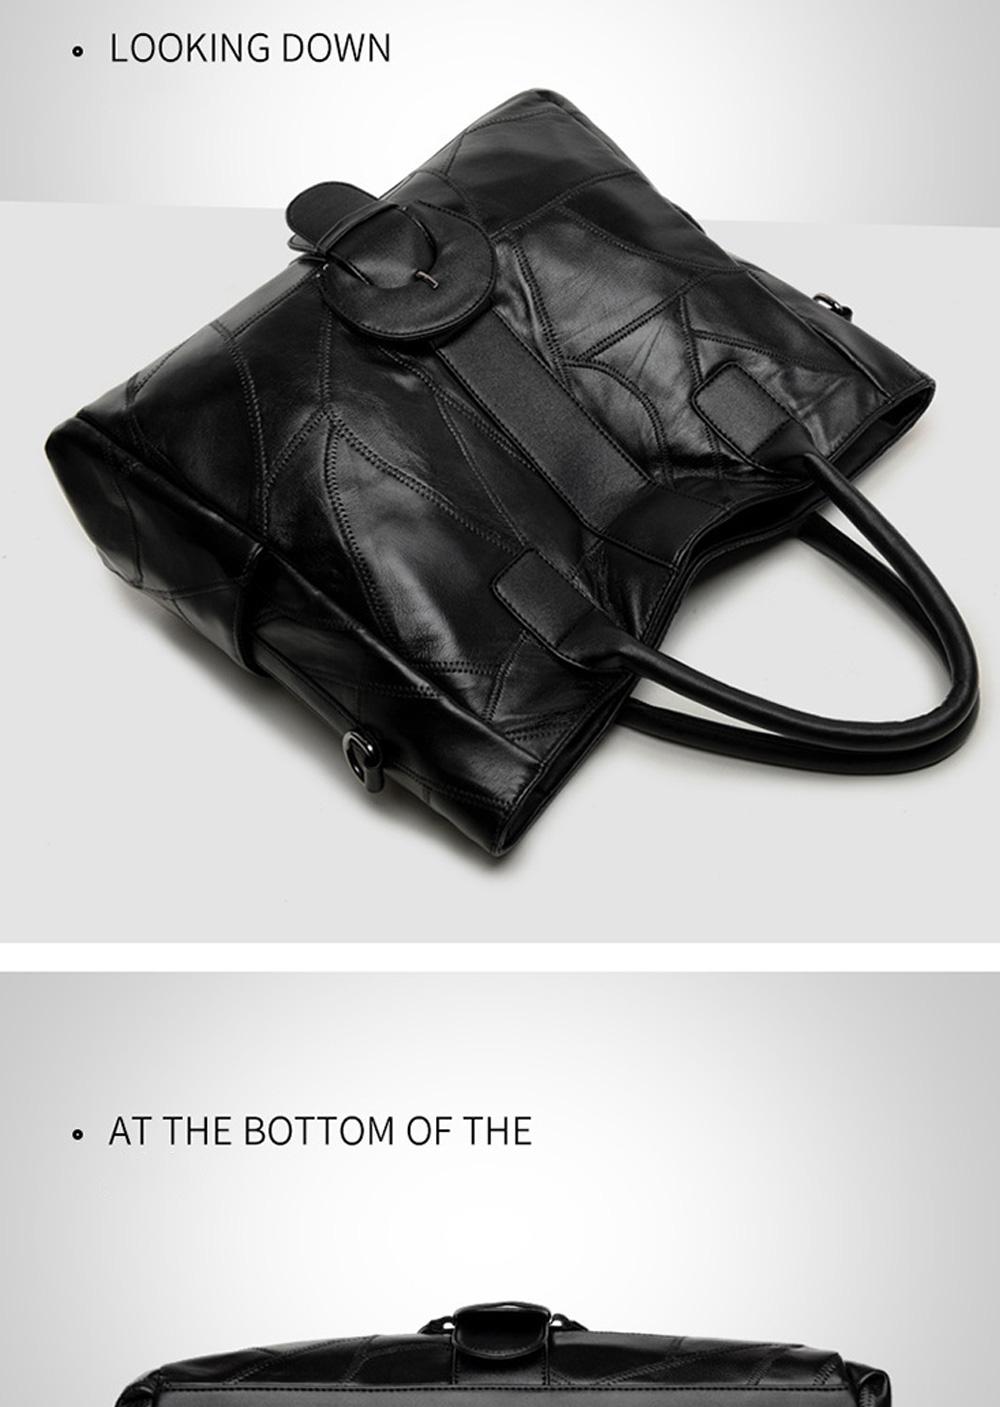 Genuine Leather Handbags Sheepskin Tote Bags, New Large-capacity Shoulder Handbags, Mommy bags Designed for women 33*10*31cm 6